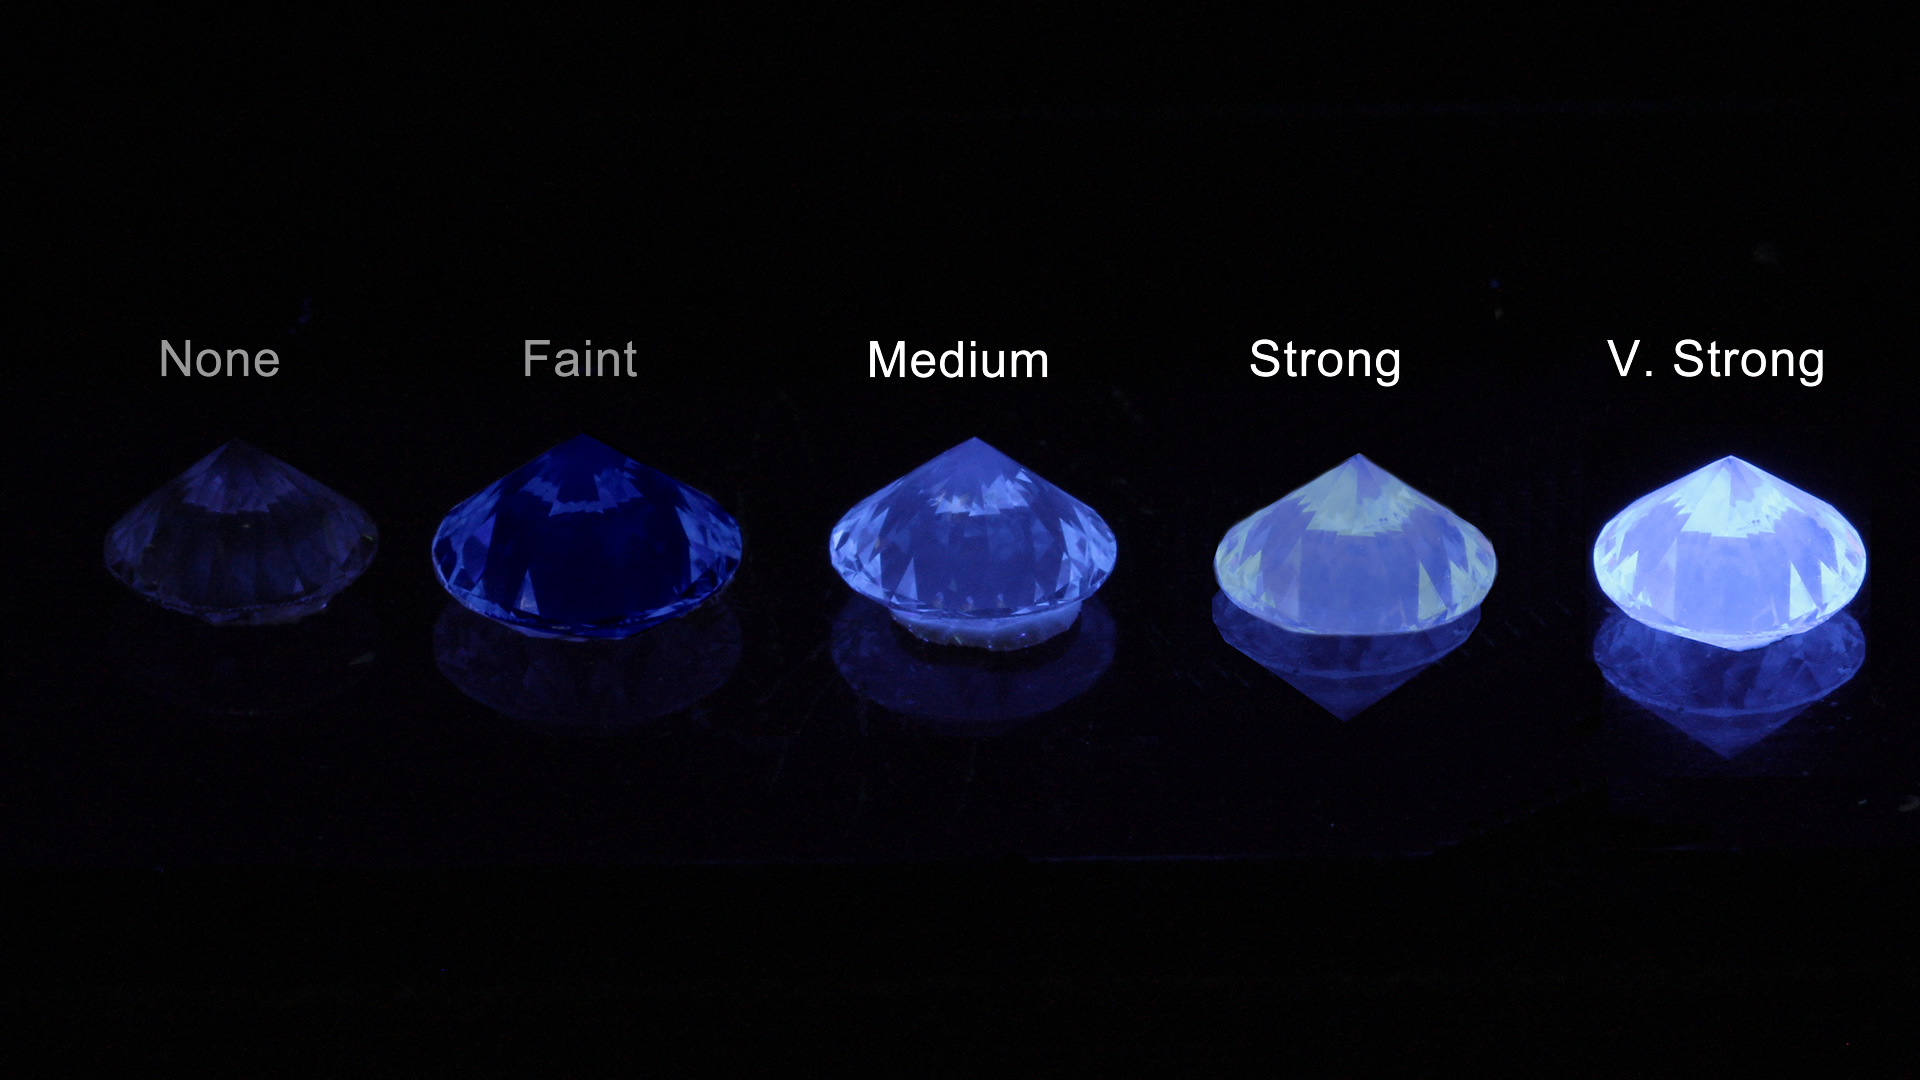 Diamond fluorescence, what is it?